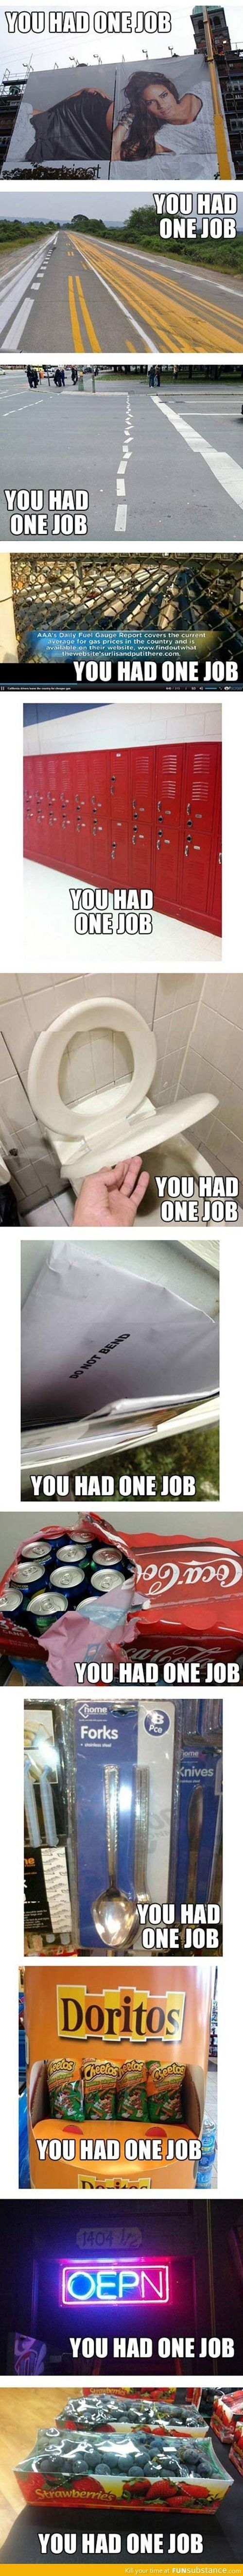 You had one job -